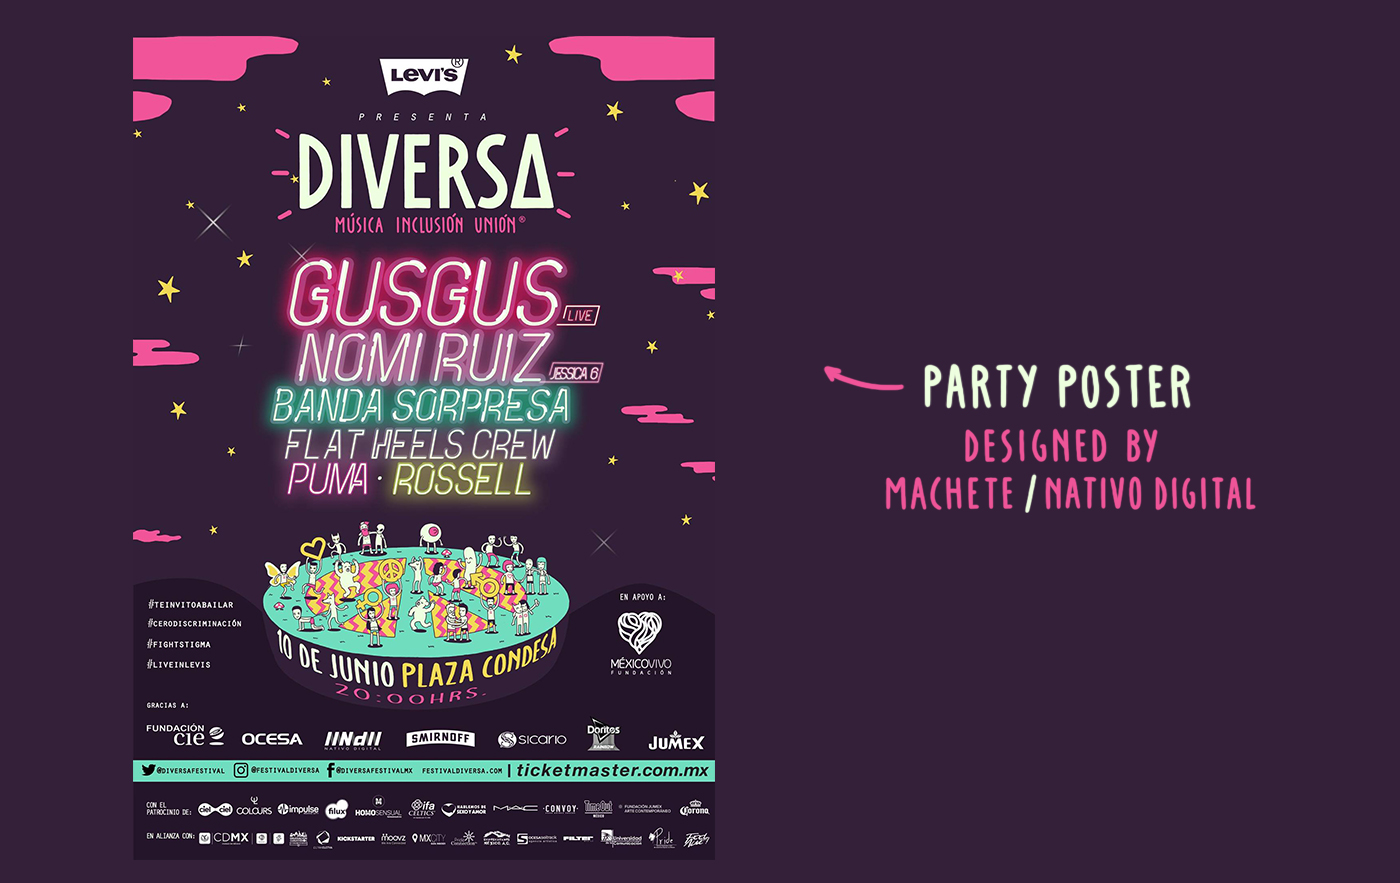 diversidad sexual festival igualdad poster sex Diversity fest equality party